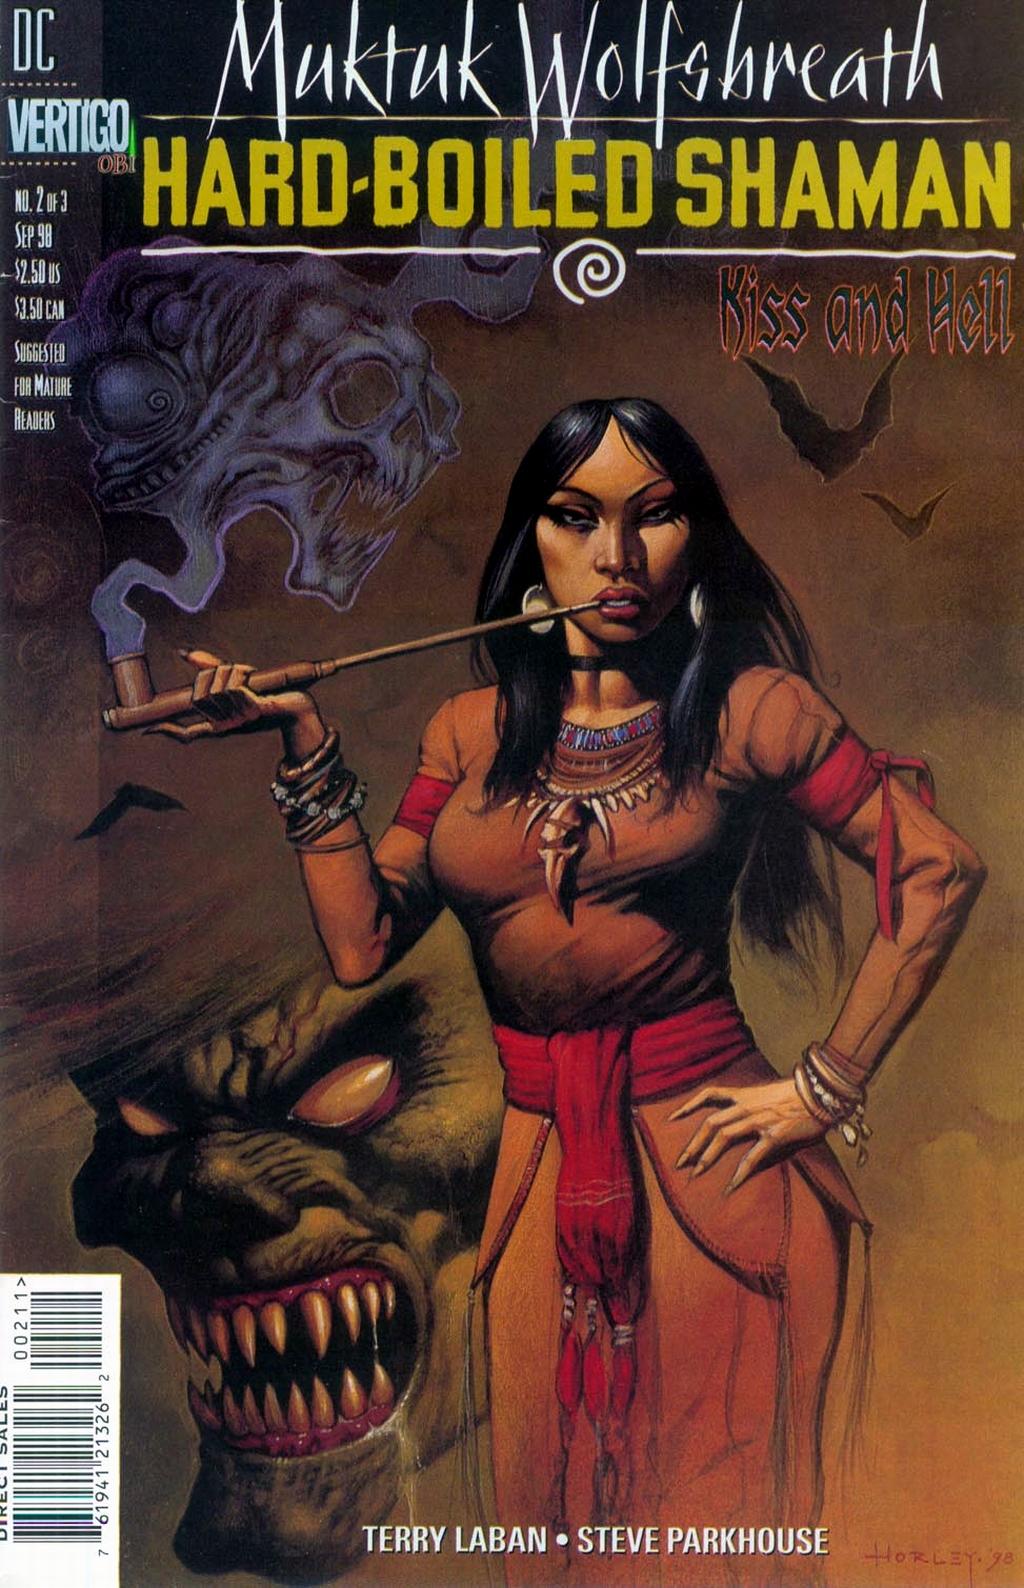 Muktuk Wolfsbreath: Hard-Boiled Shaman issue 2 - Page 1